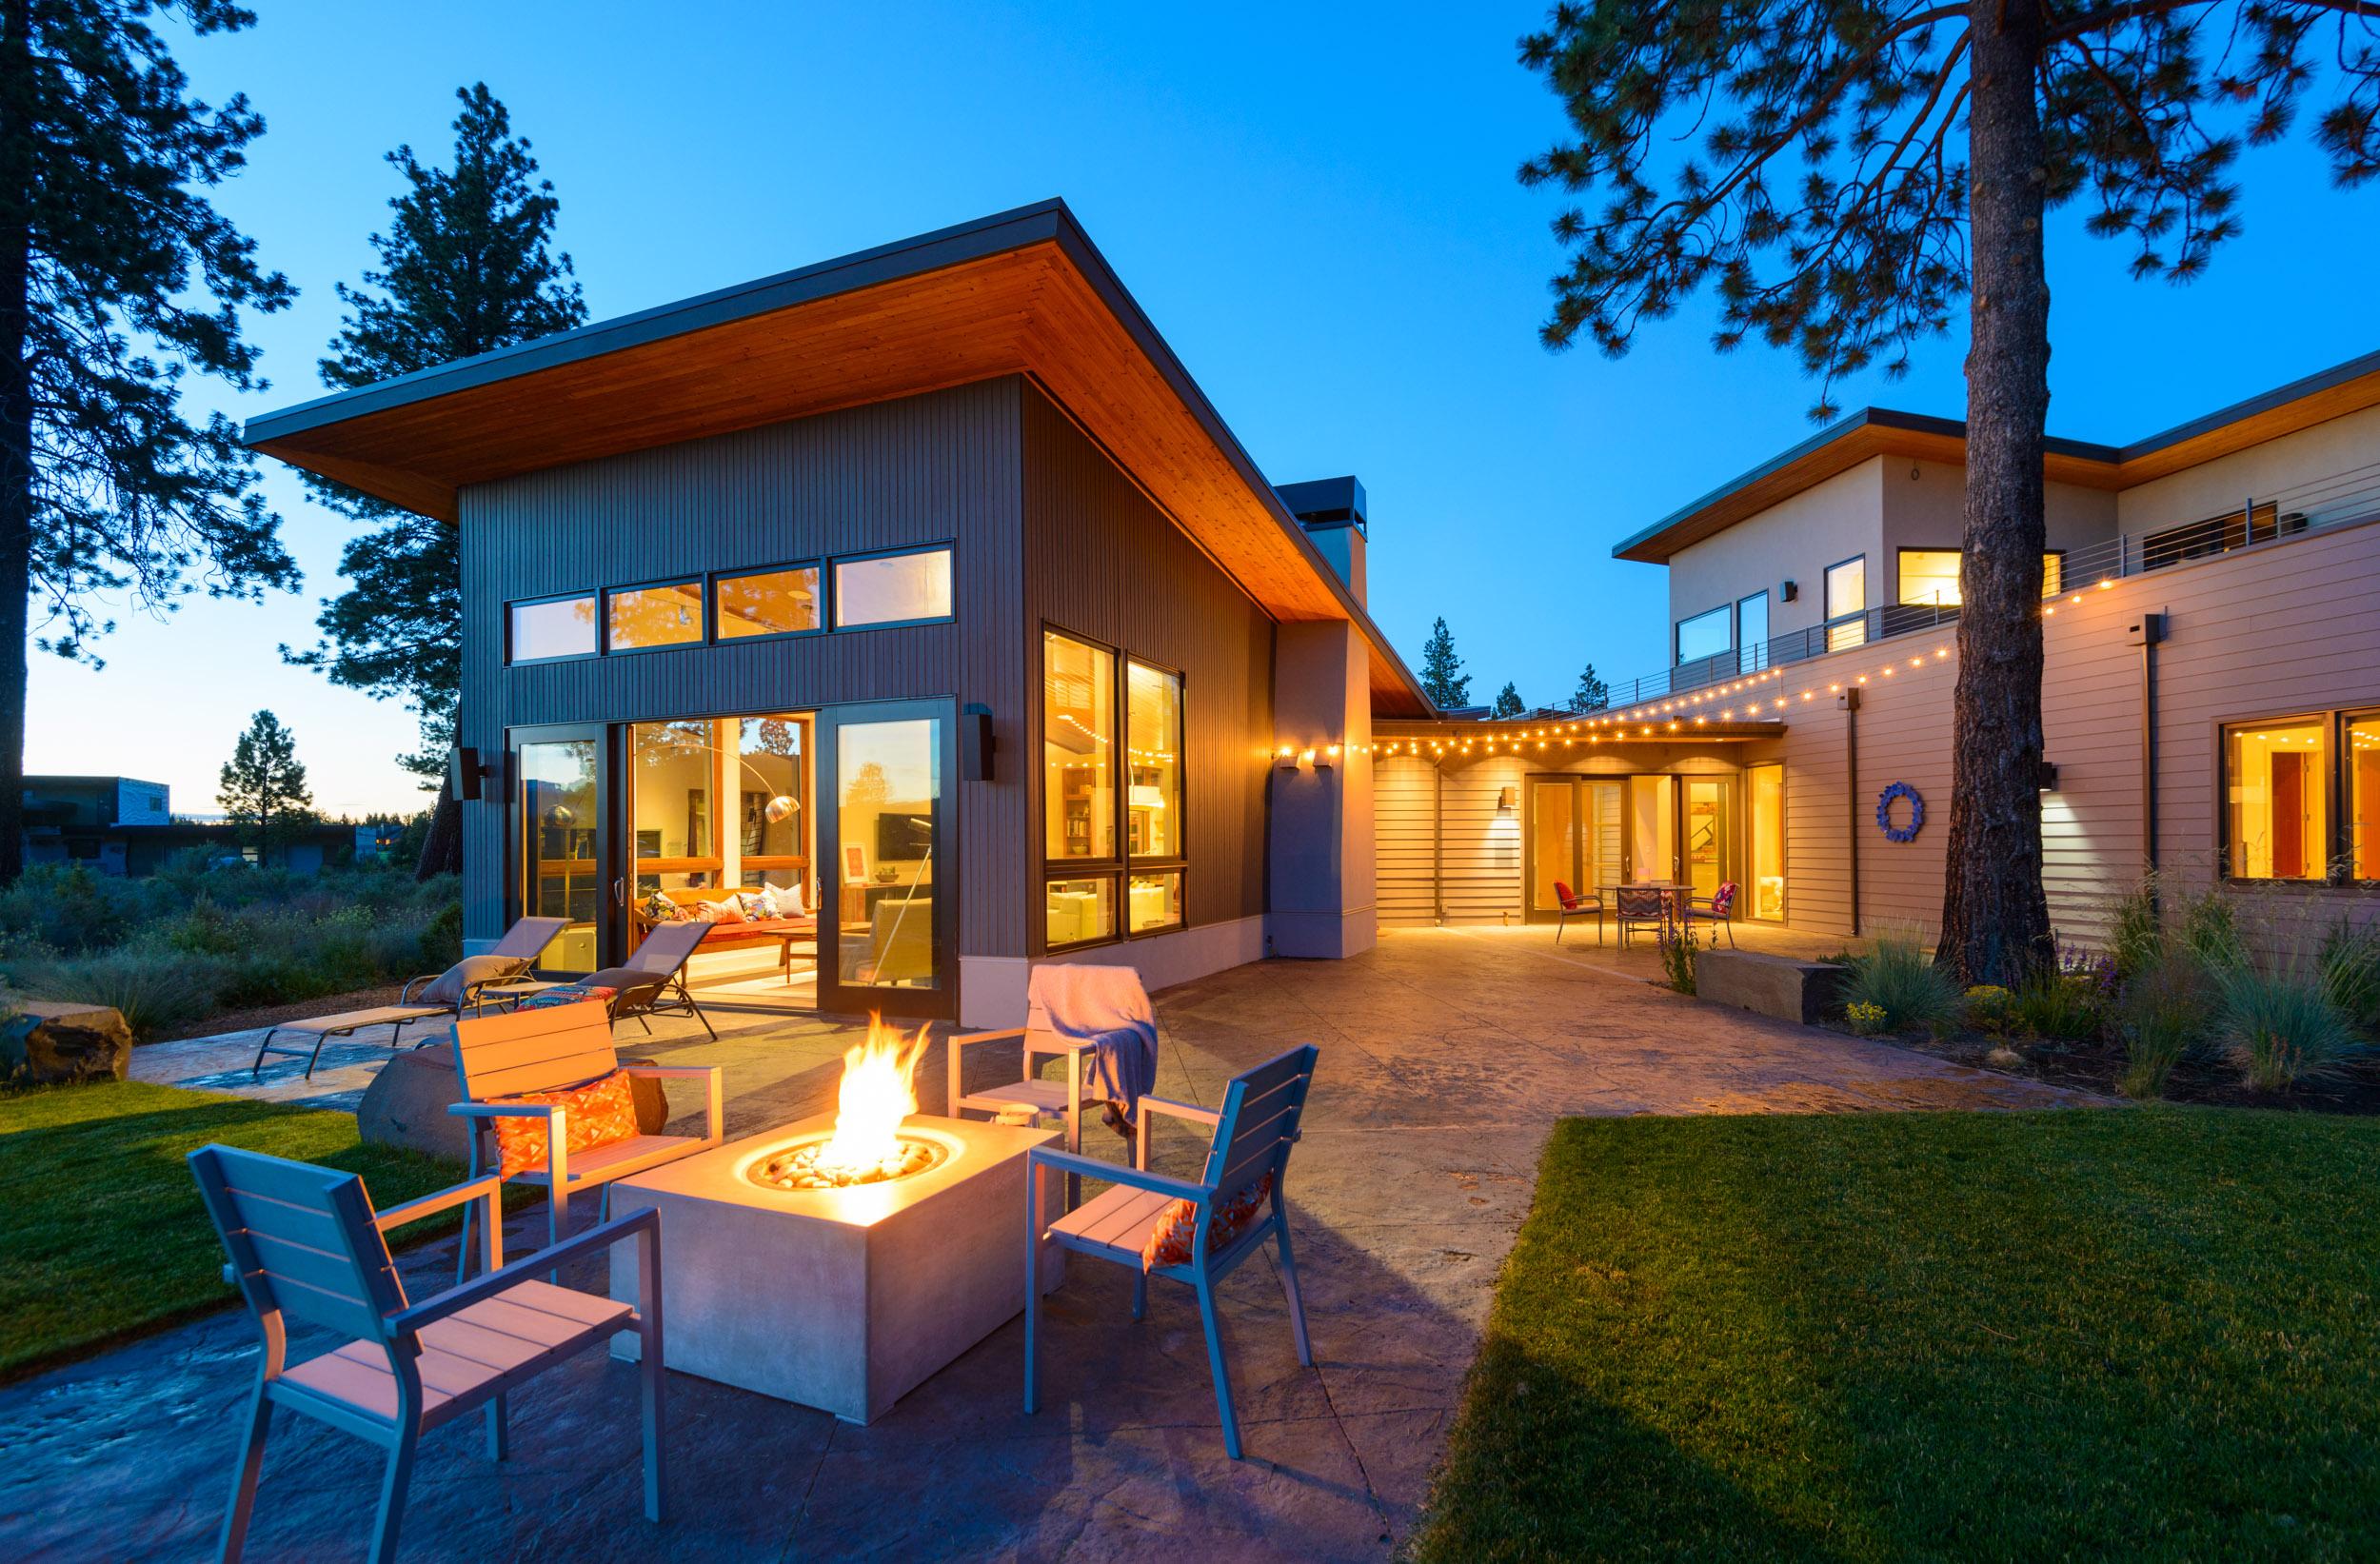 contemporary-modern-design-home-at-dusk-